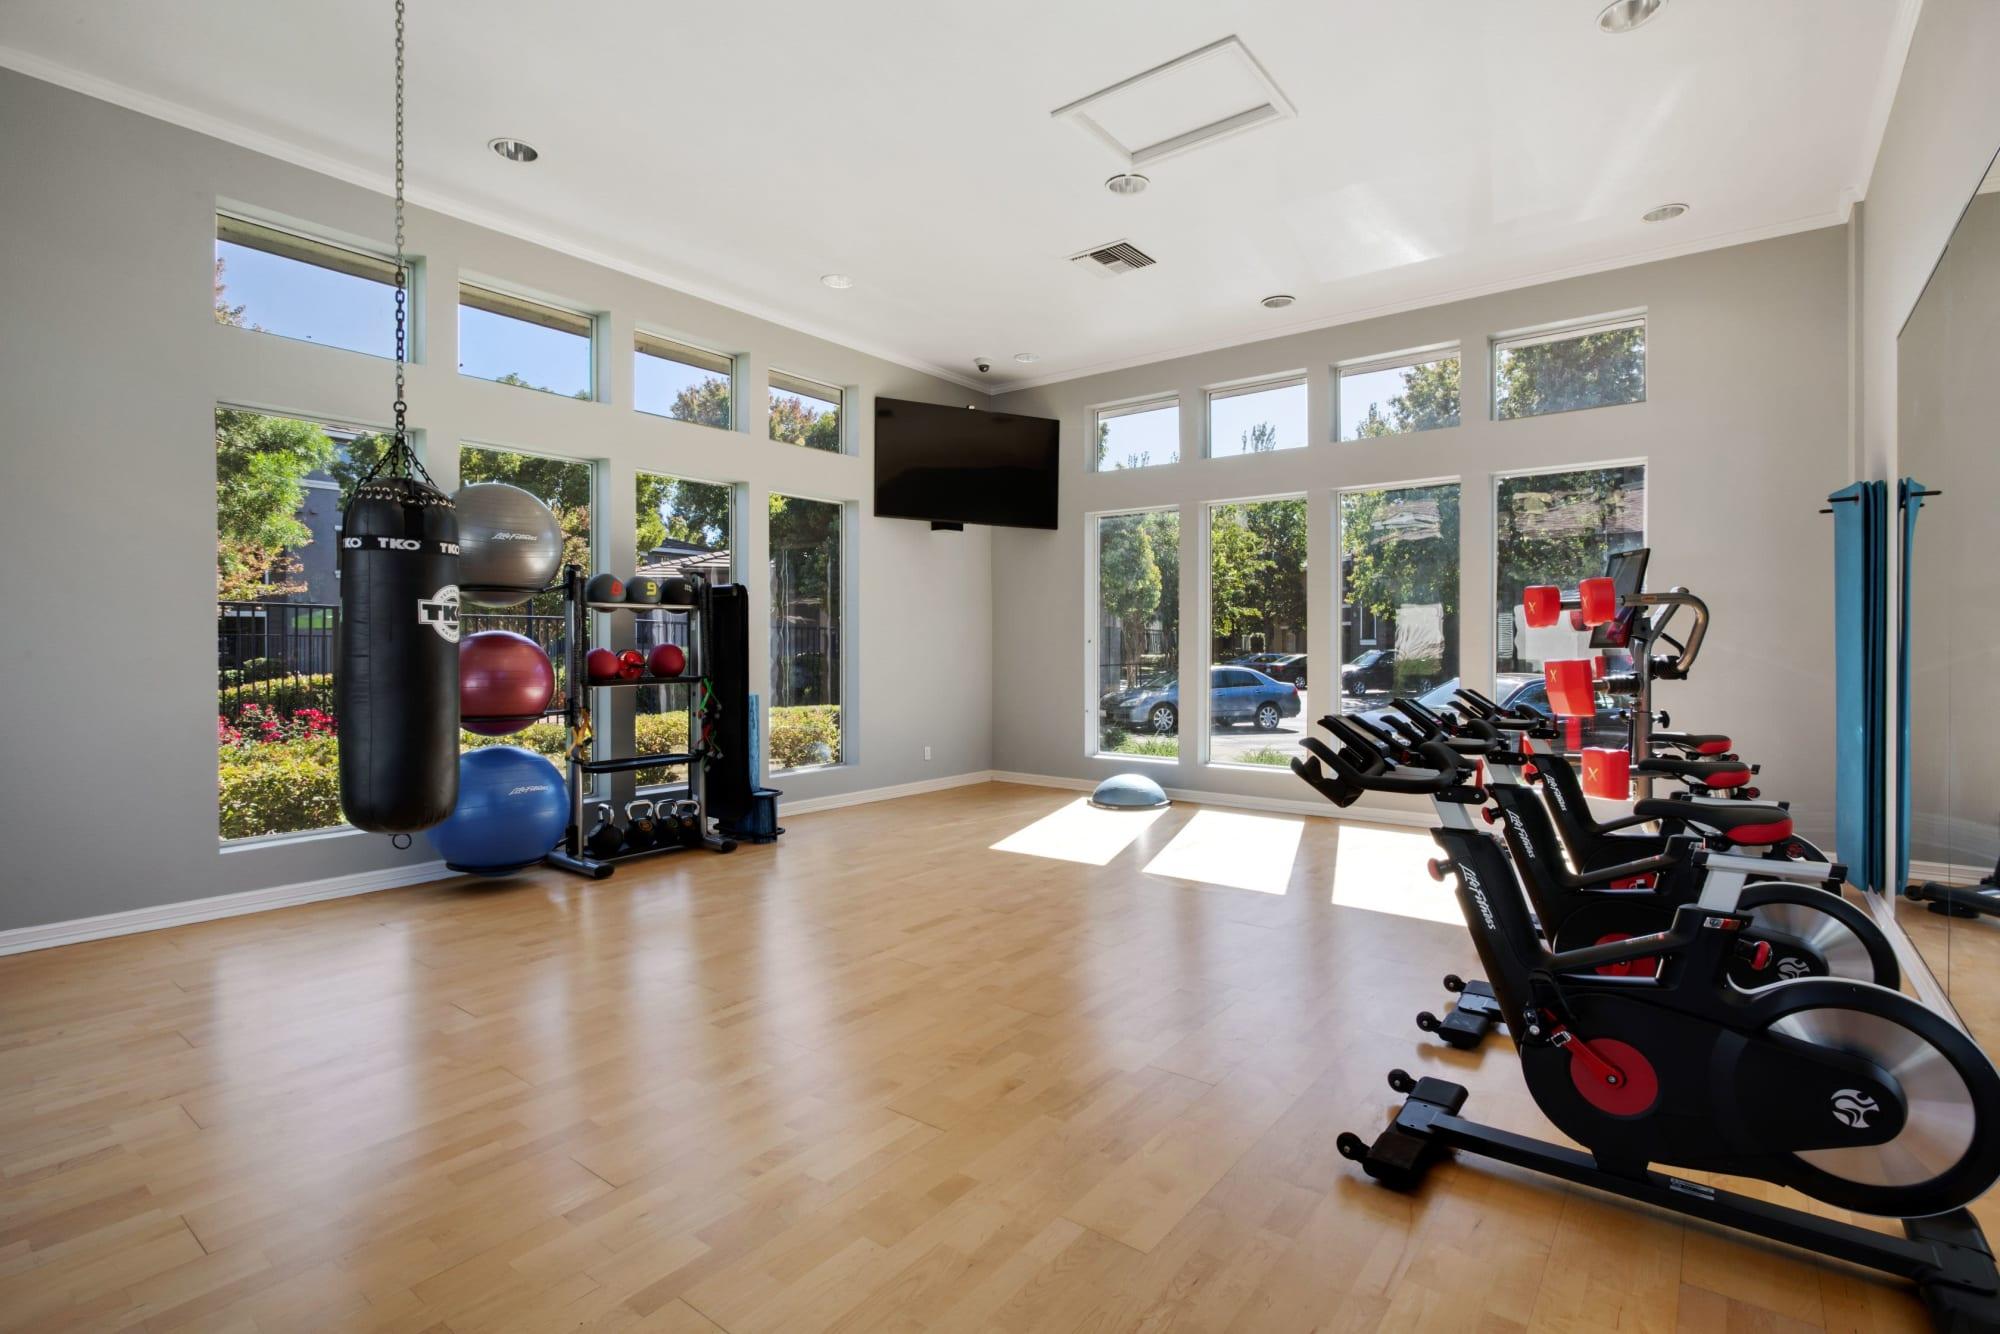 Fitness On Demend Room at Miramonte and Trovas in Sacramento, California